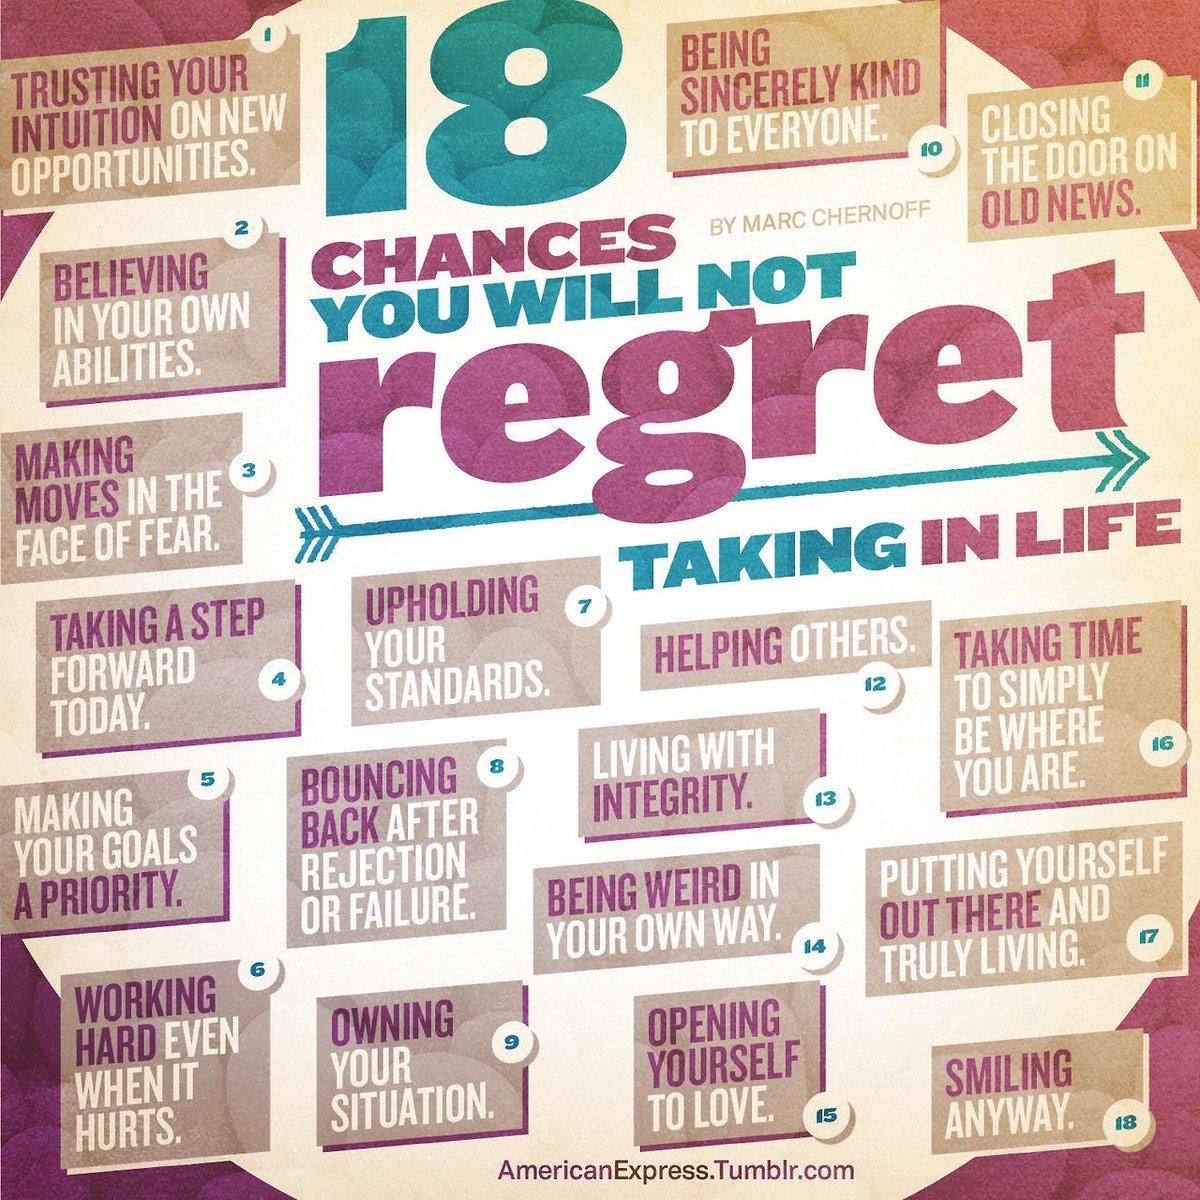 18 Chances You Will Not Regret Taking in Life: http://t.co/U2U76f0avD http://t.co/qLaJWhMYqM